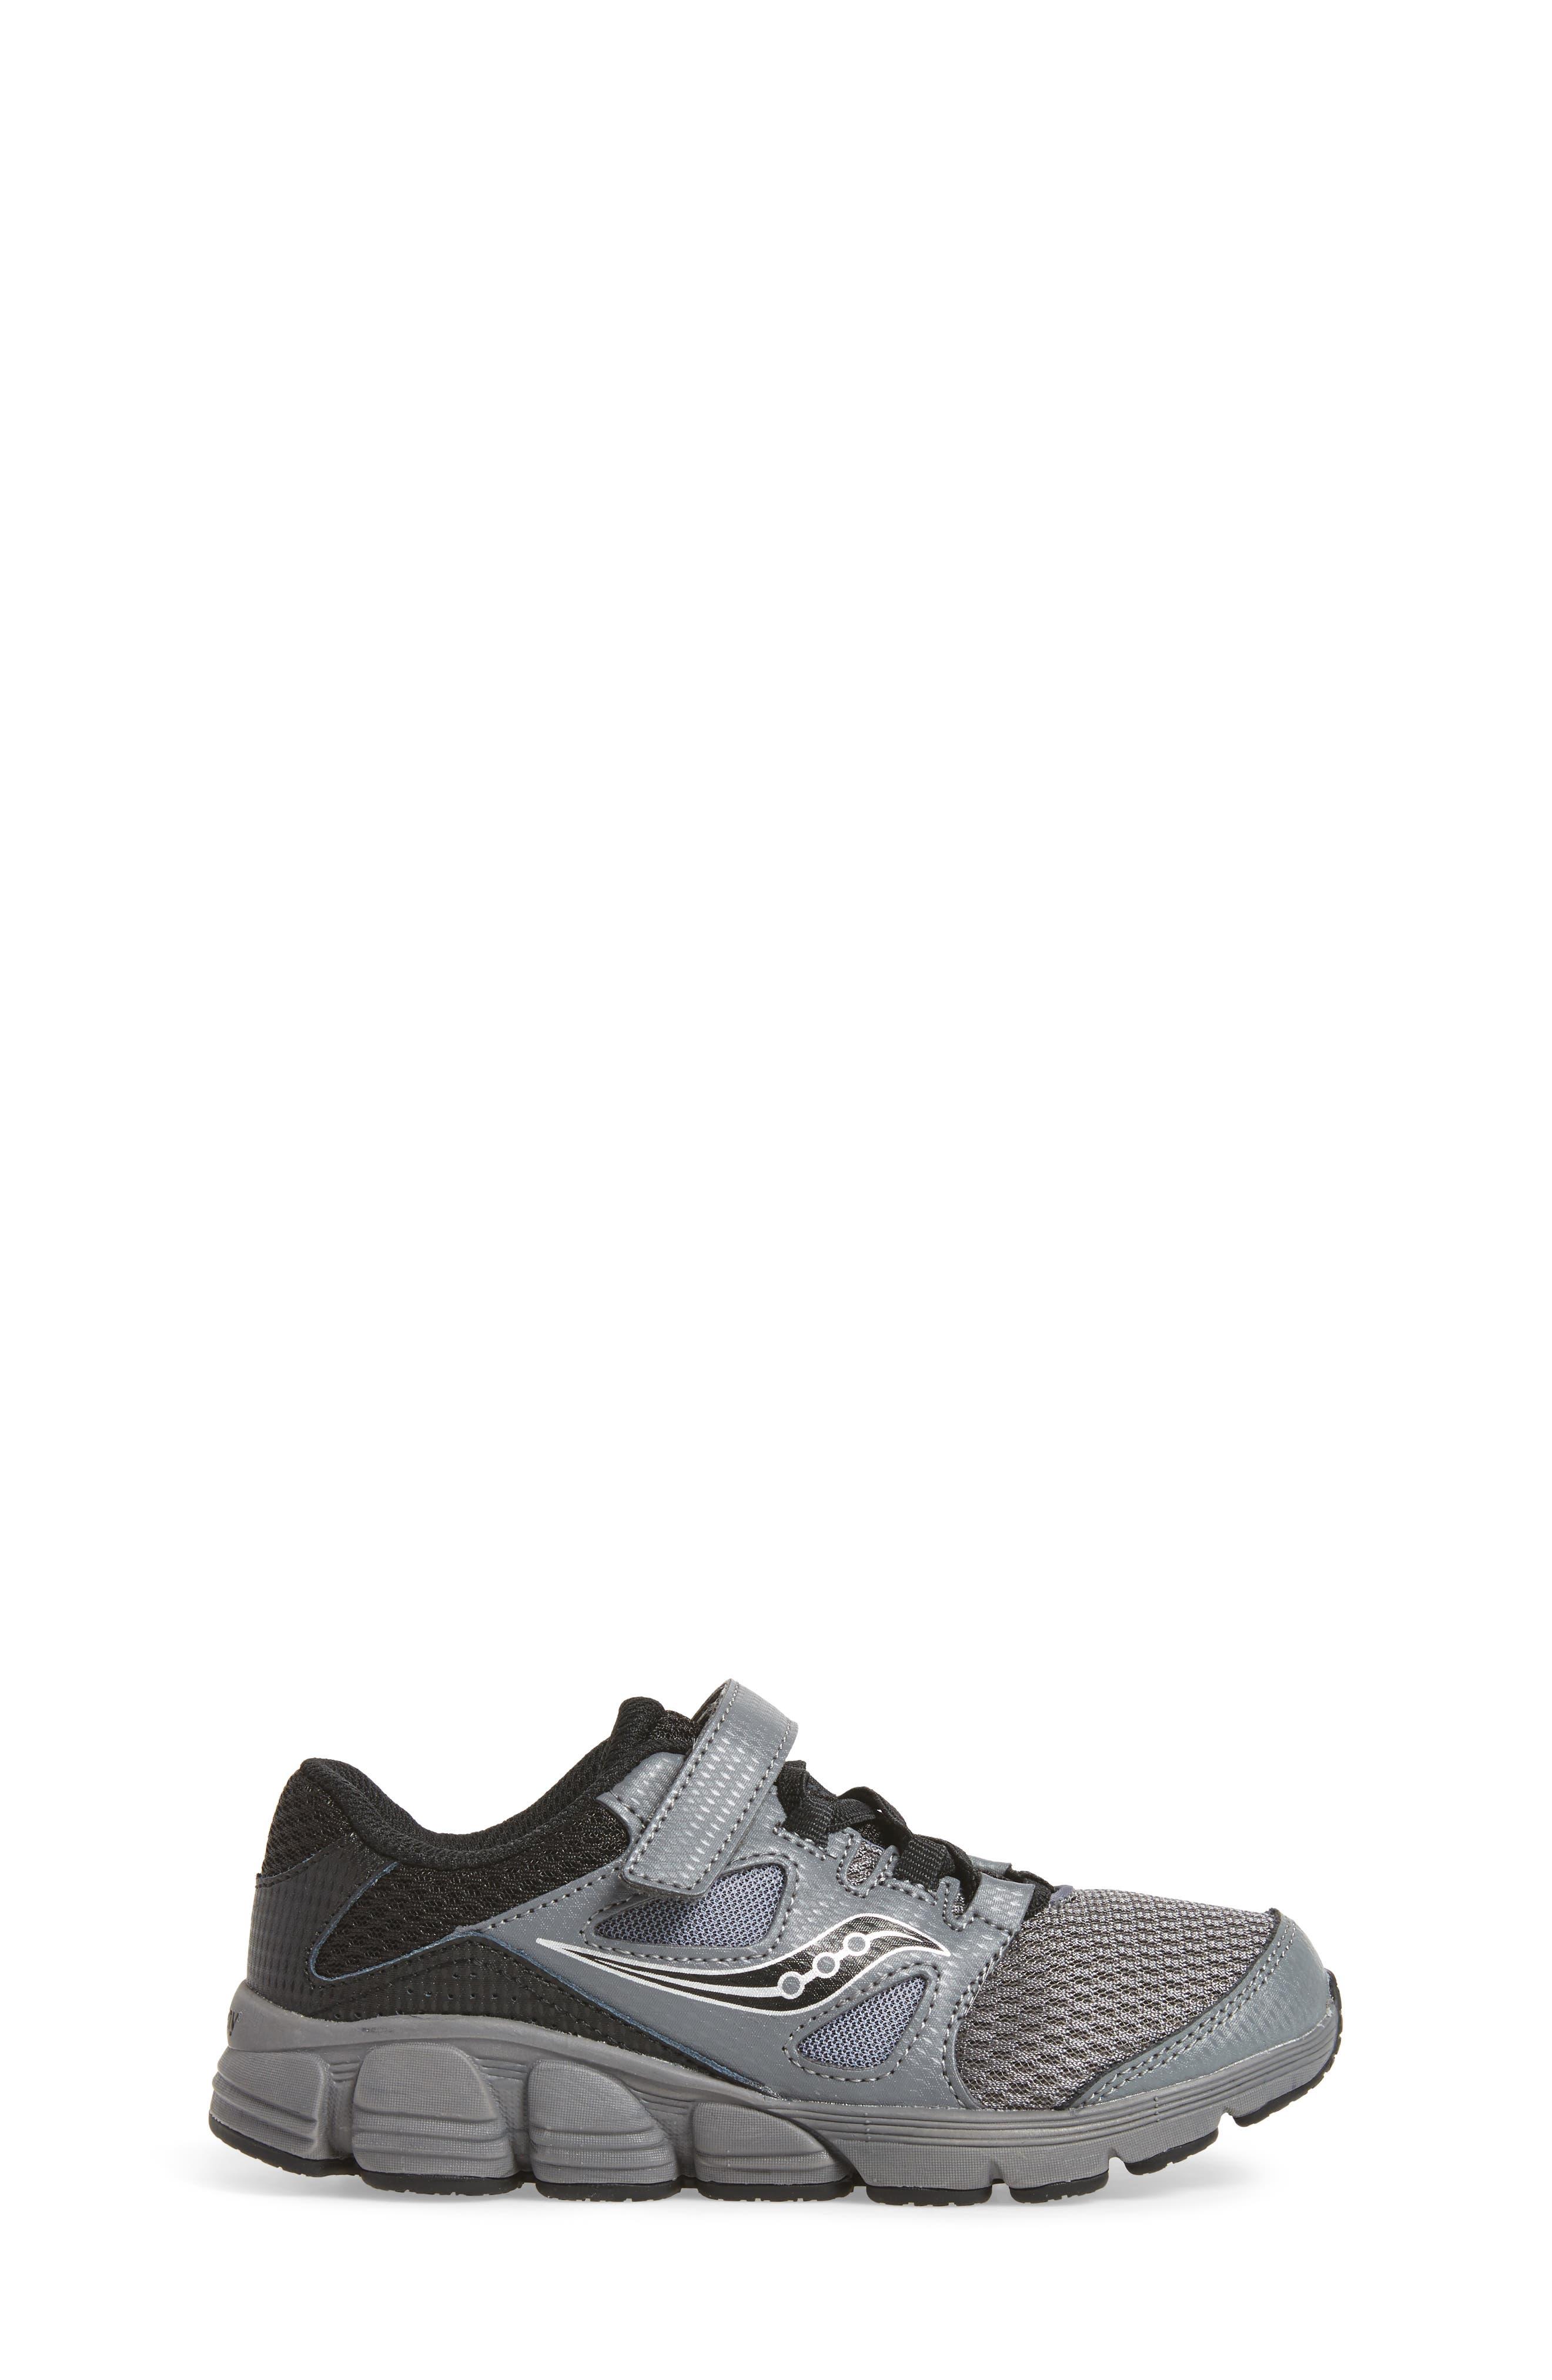 Kotaro 4 A/C Athletic Sneaker,                             Alternate thumbnail 3, color,                             021